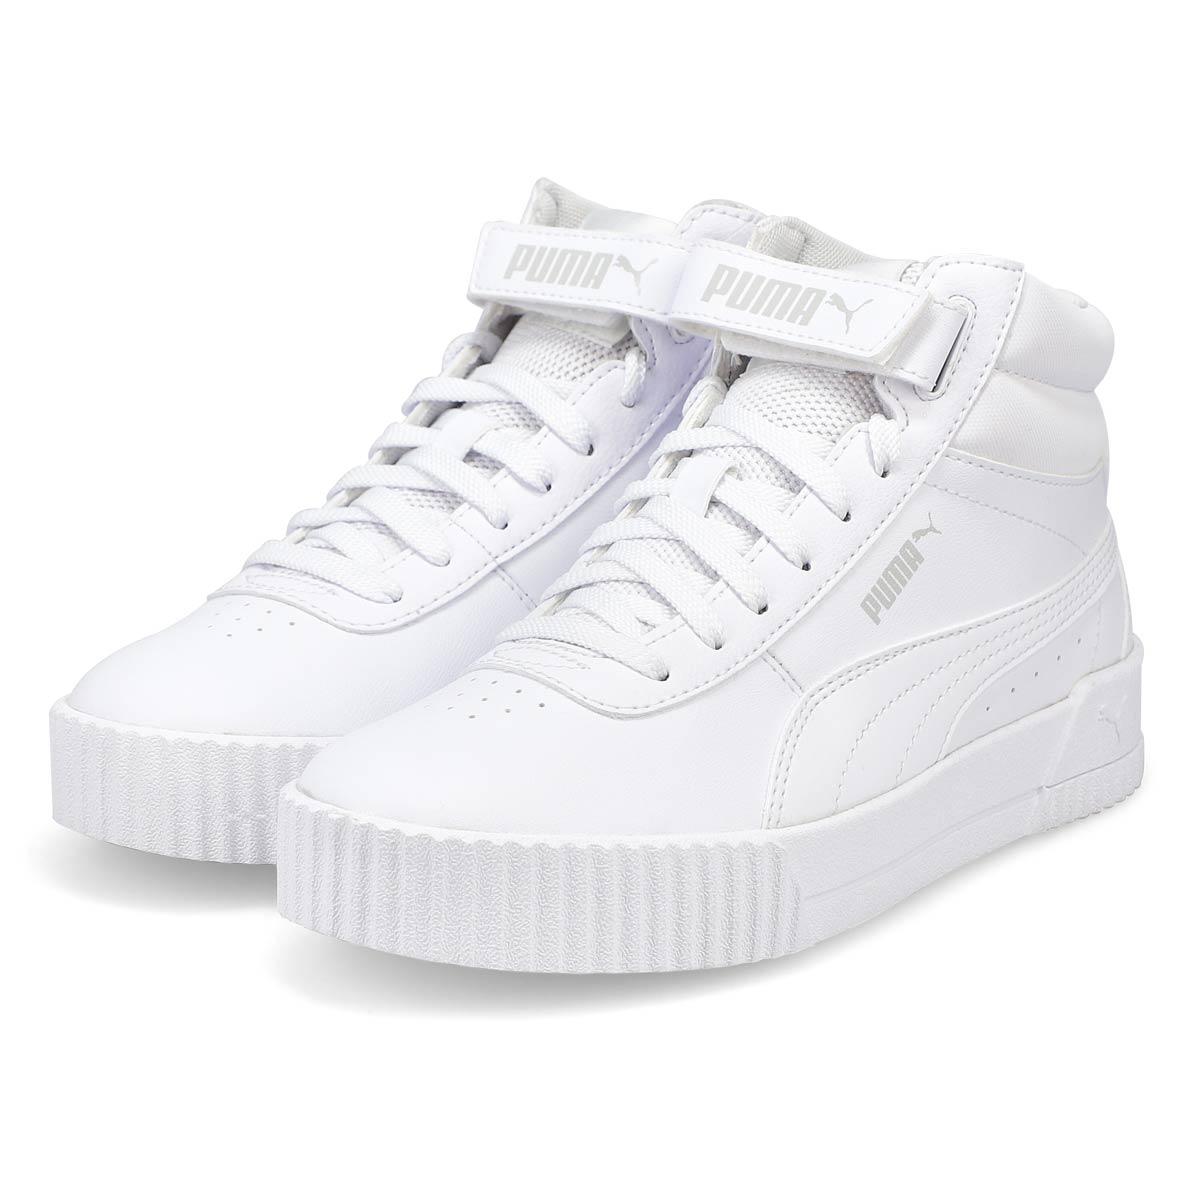 Women's Carina Mid Sneaker - White